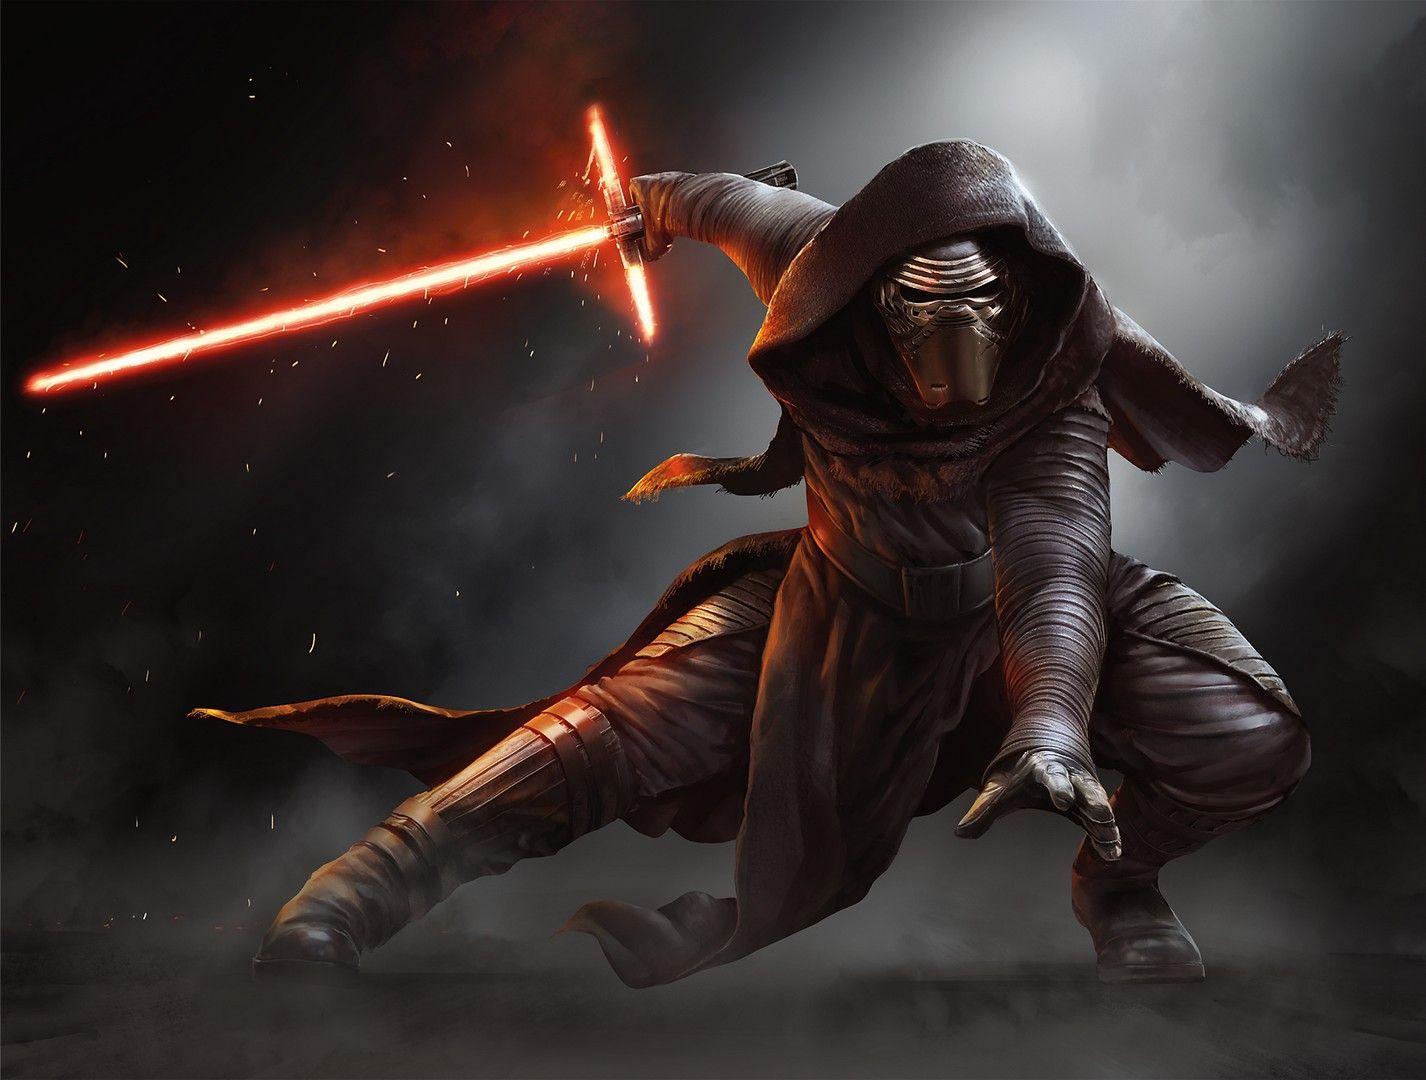 Ben Solo Wallpapers Top Free Ben Solo Backgrounds Wallpaperaccess